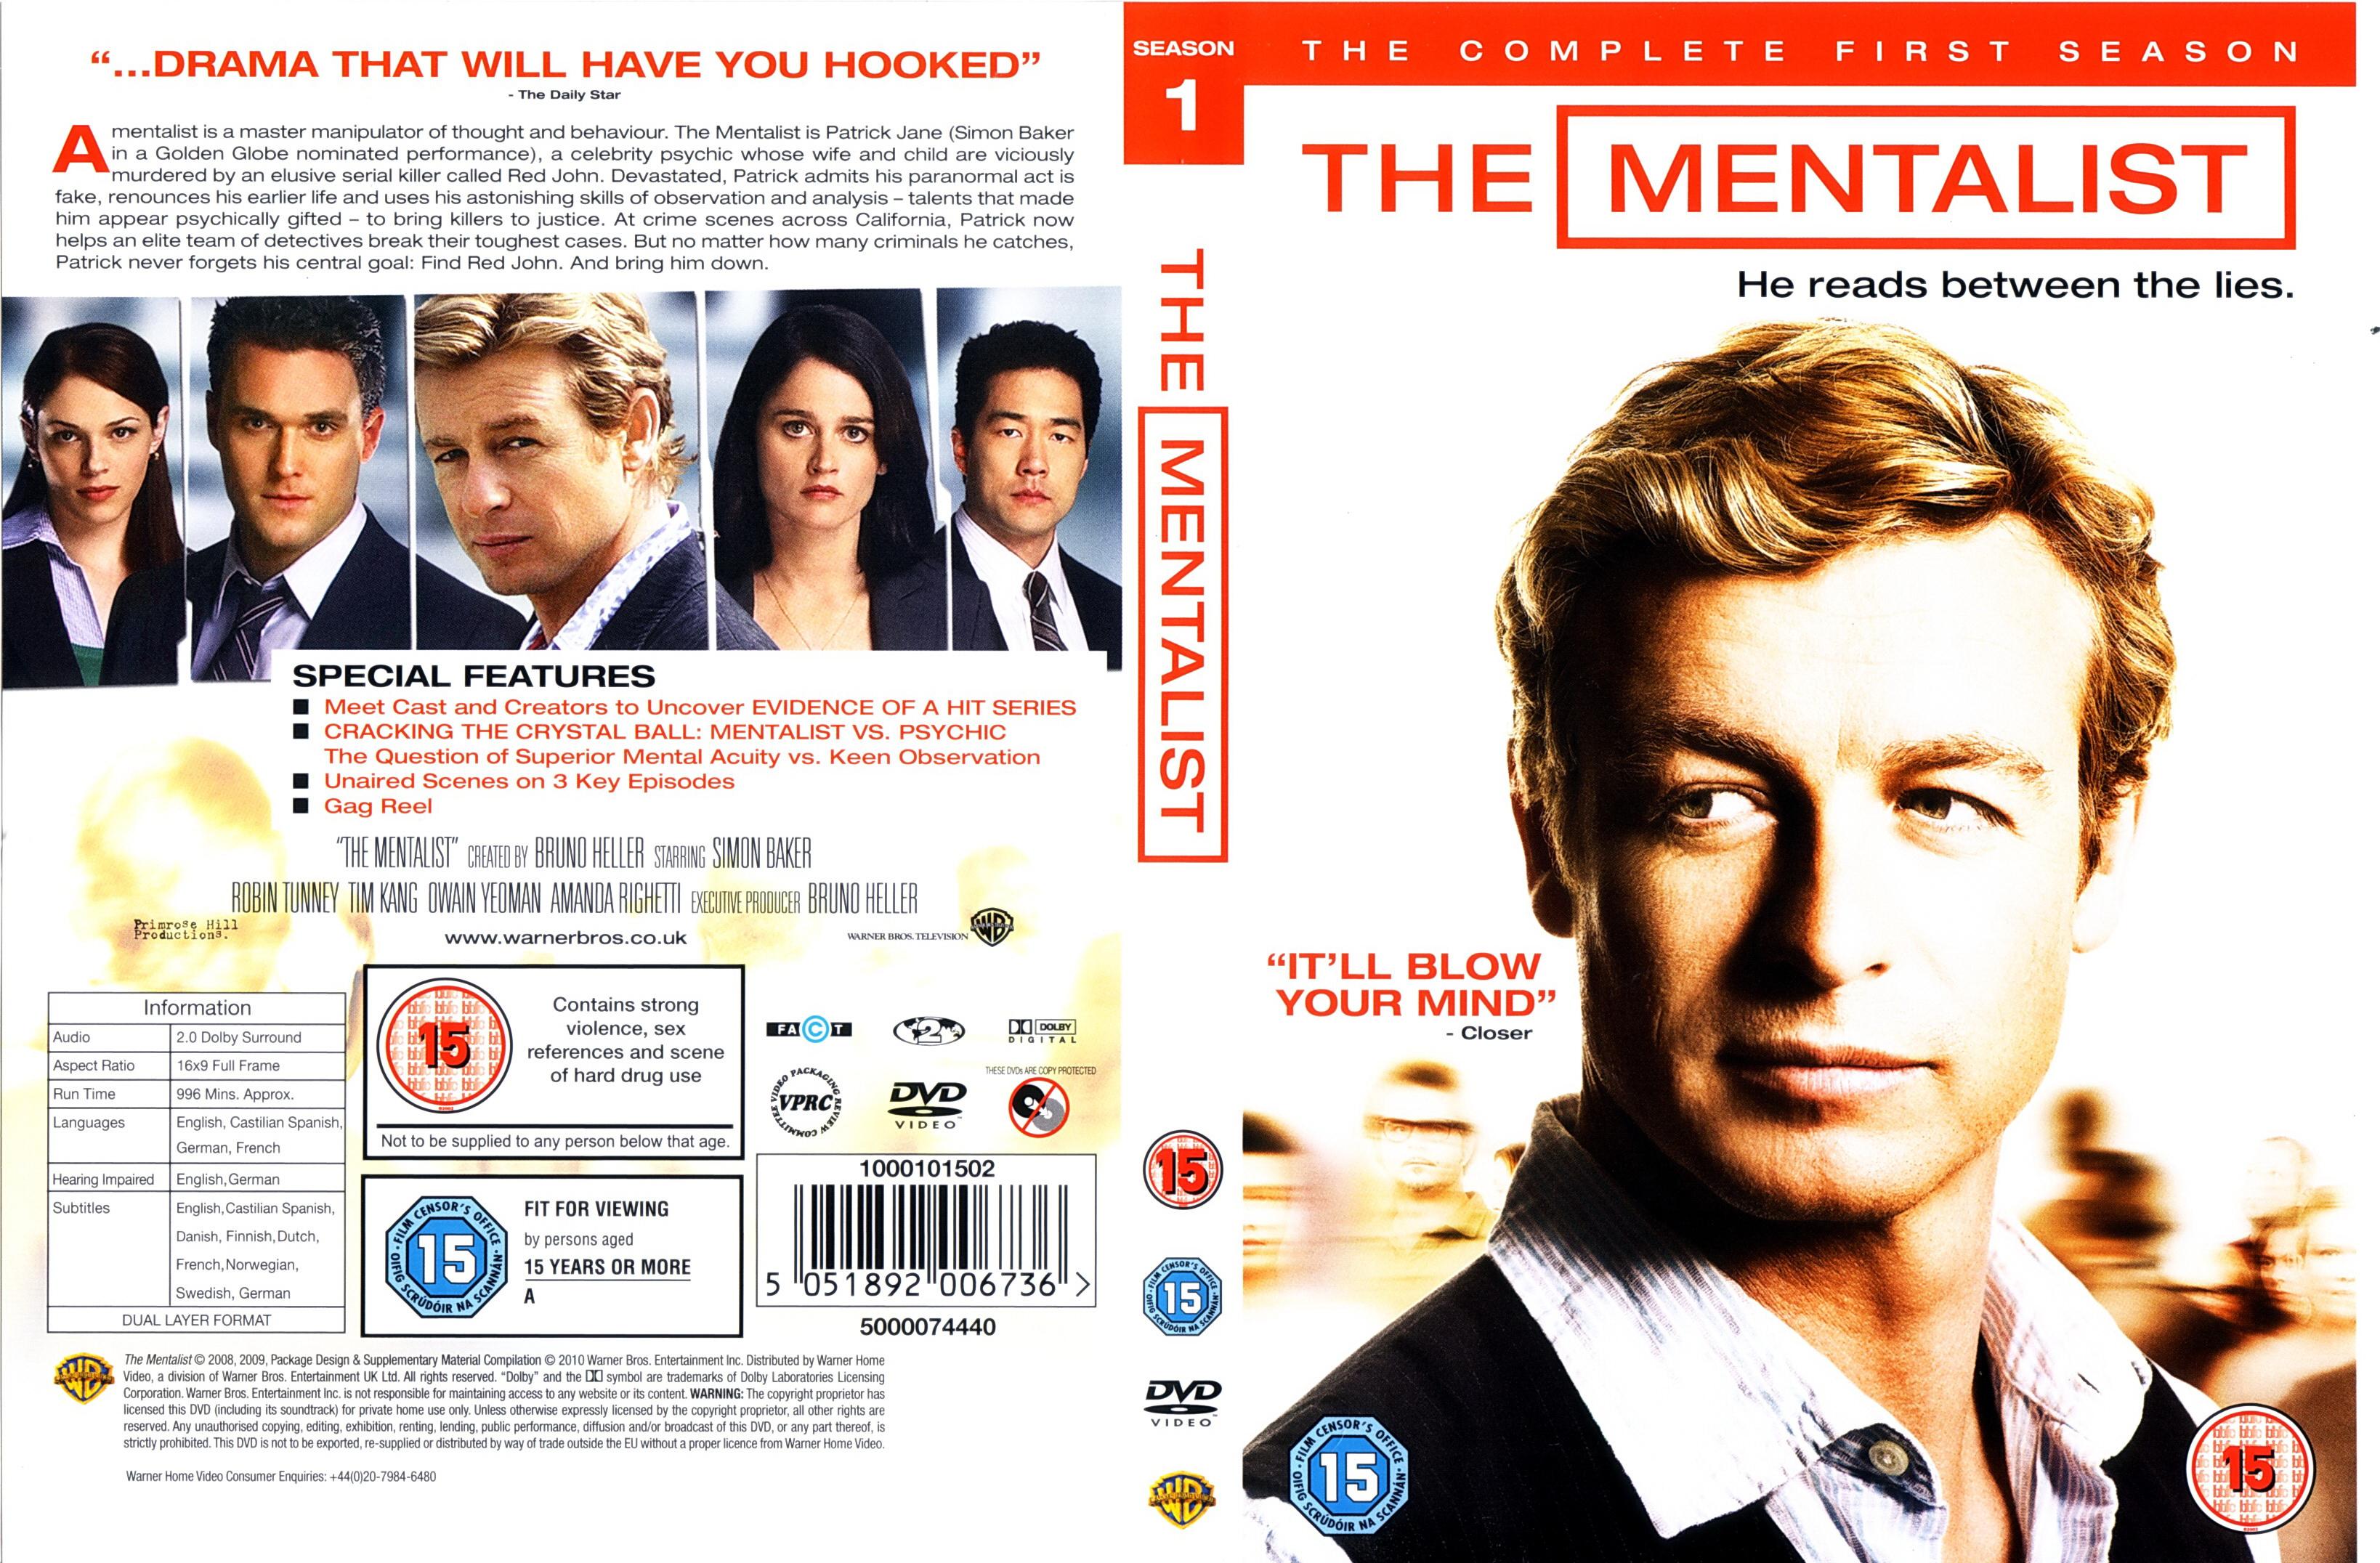 the mentalist saison 1 مترجم عربي The_Mentalist_Saison_1_Zone_1-11384229042010